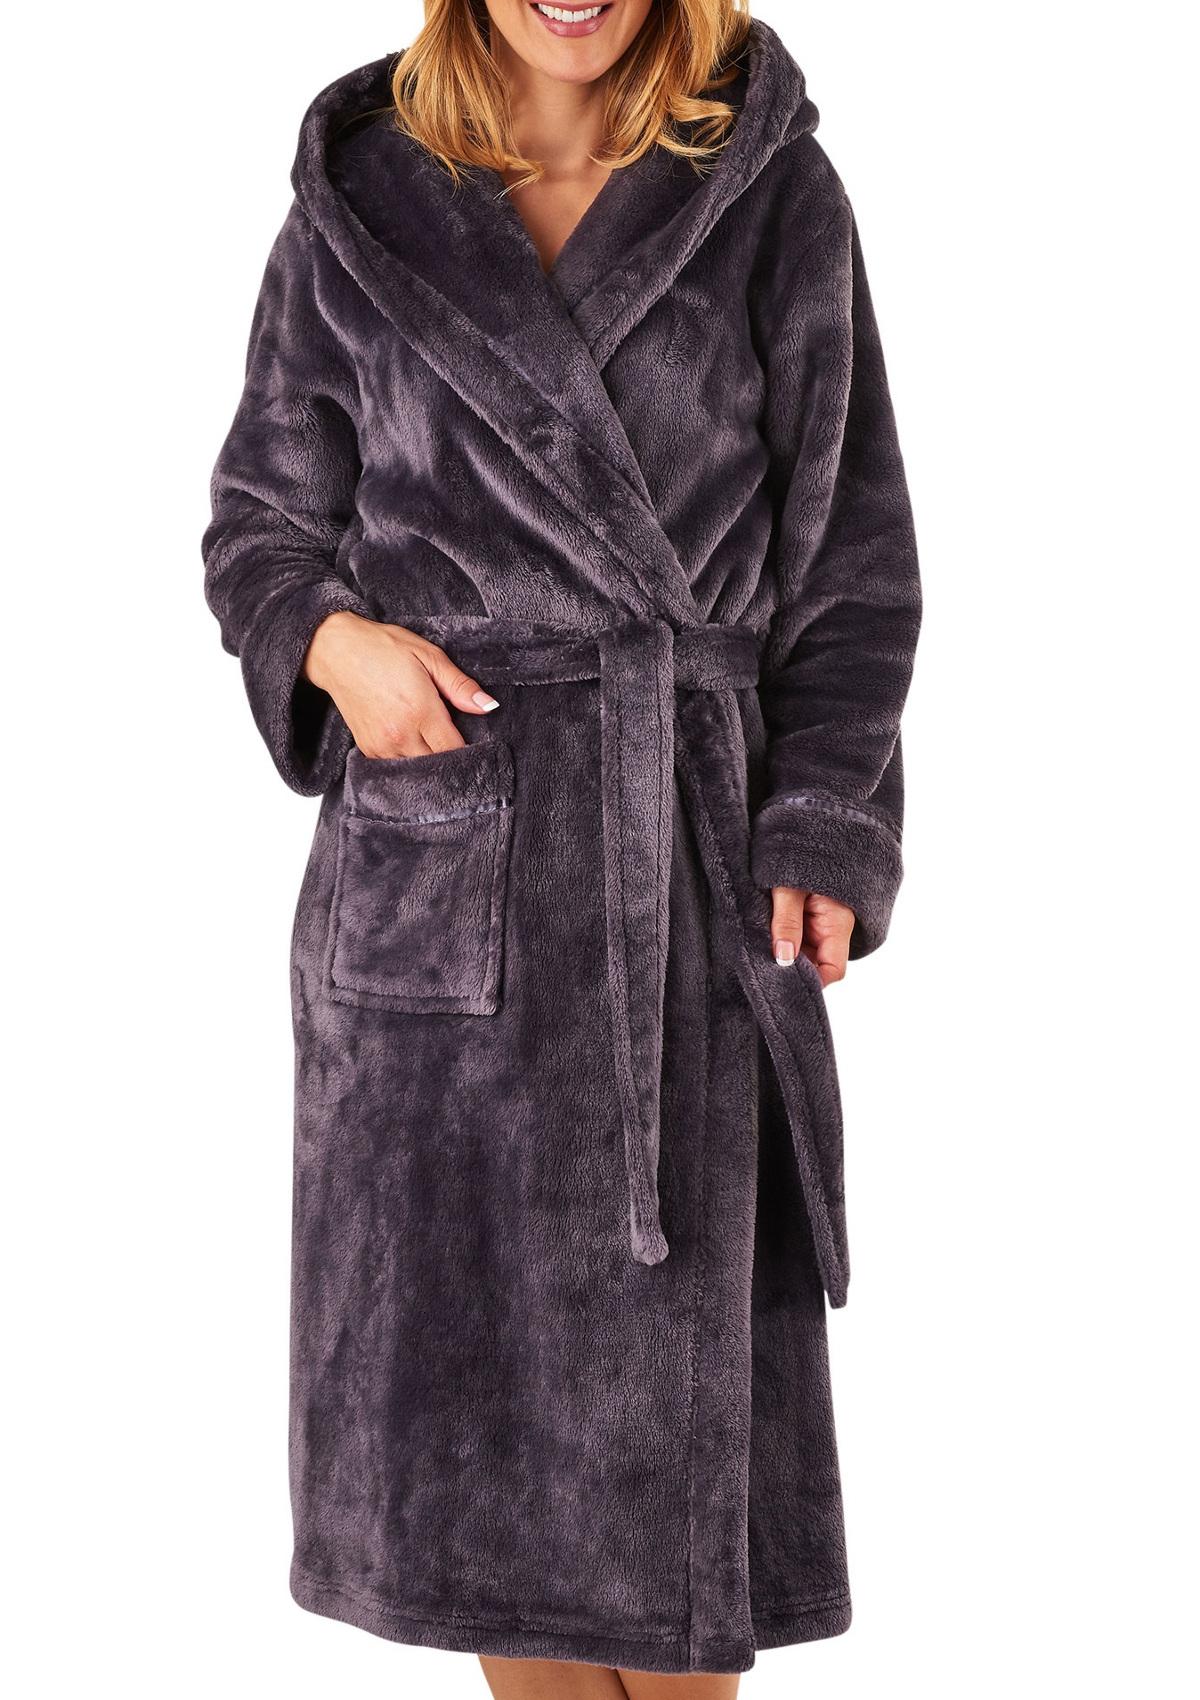 4f356aeca1ff6 Slenderella Womens Super Soft Thick Fleece Dressing Gown Luxury ...